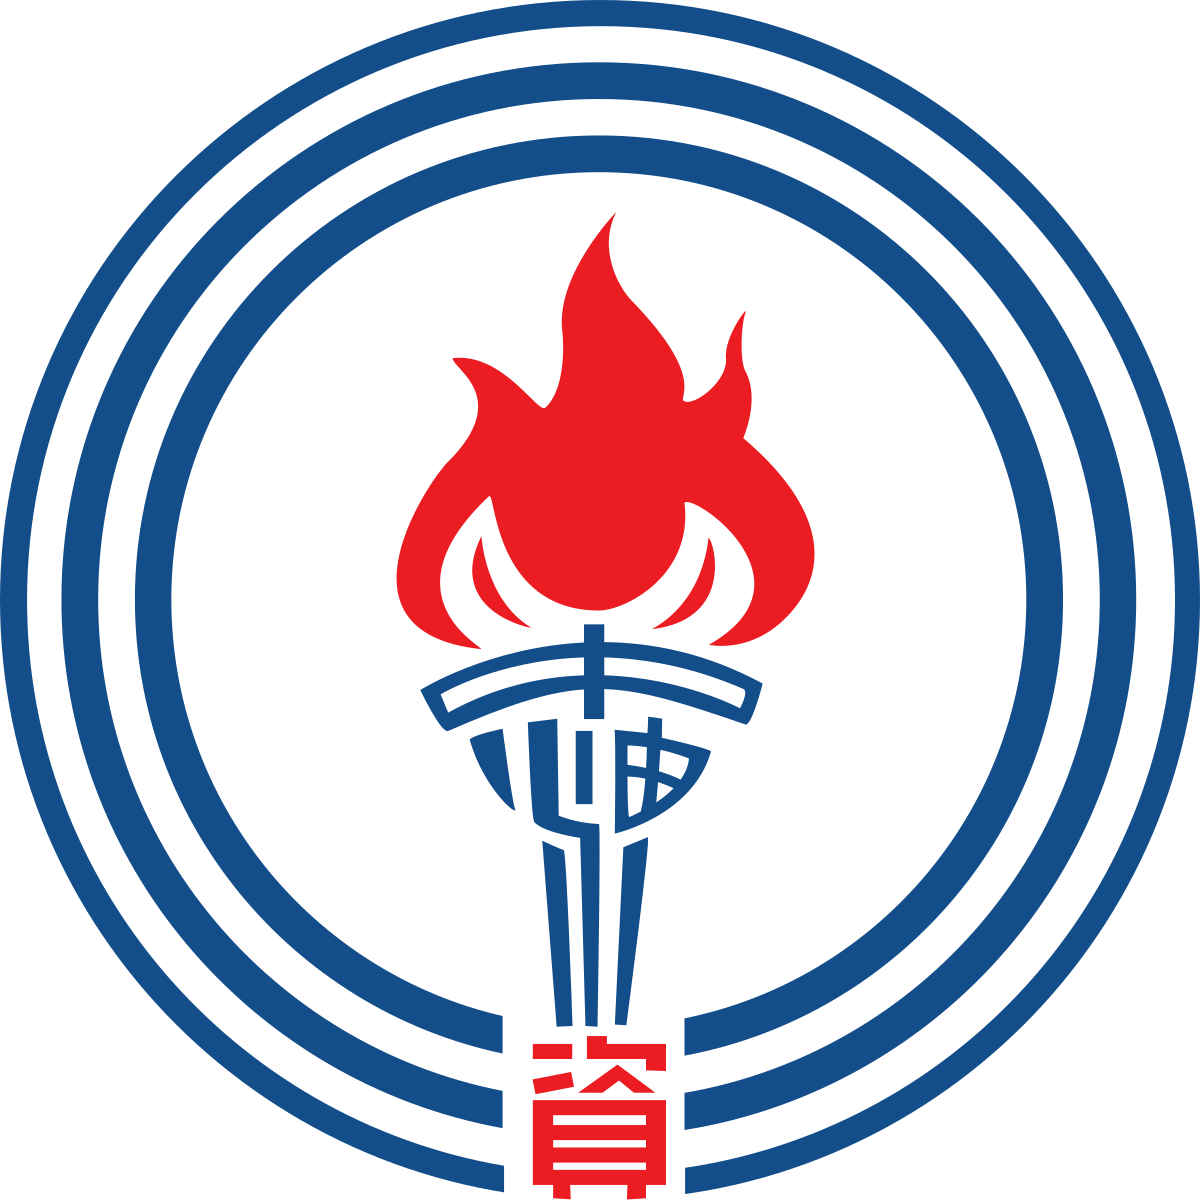 Cpc corporation wikipedia . Gas clipart petrochemical